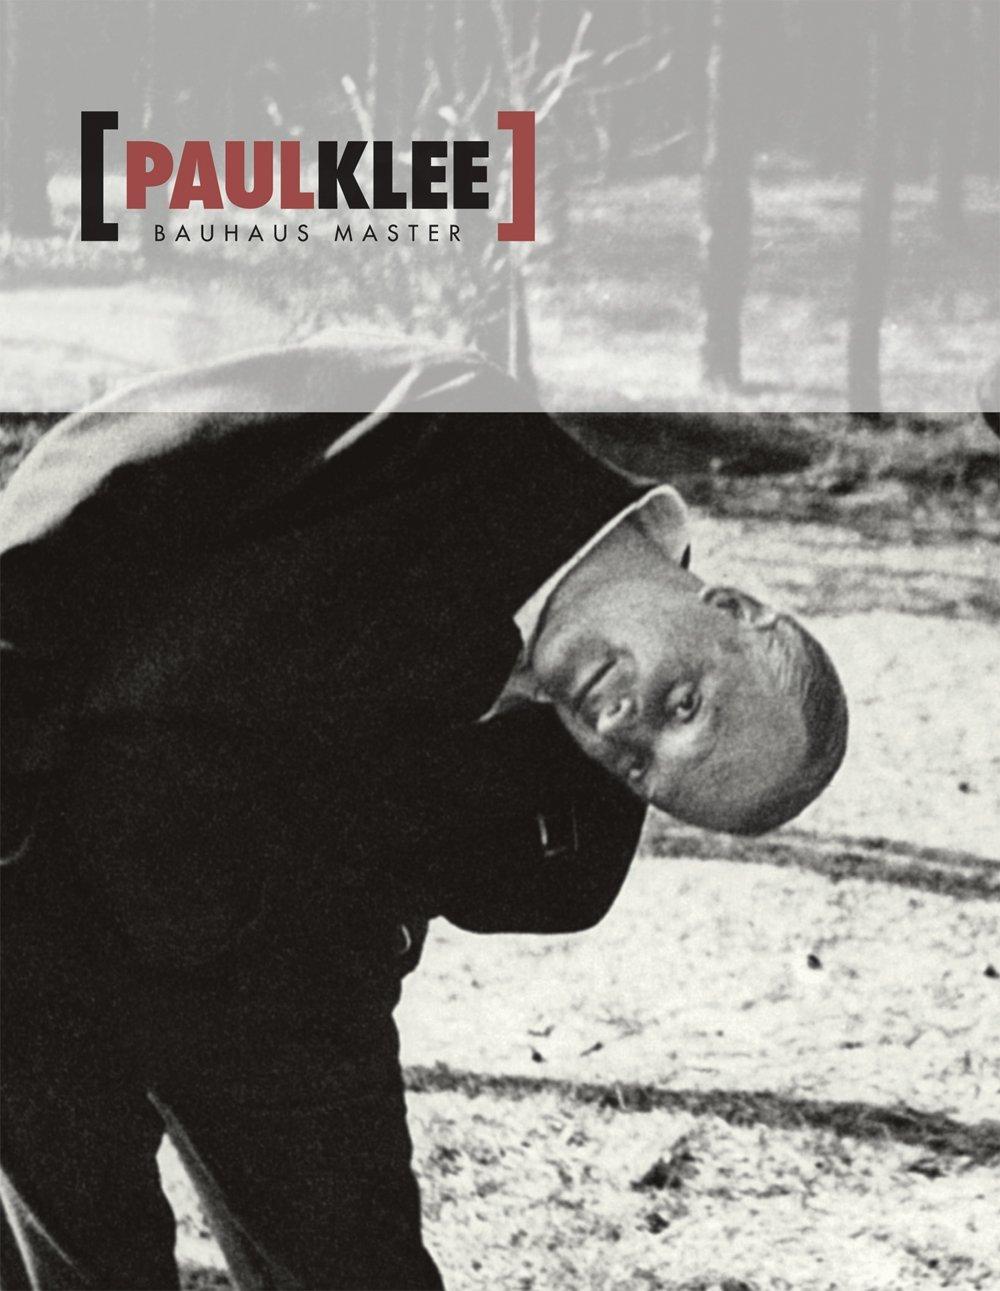 Paul Klee: Maestro de la Bauhaus -